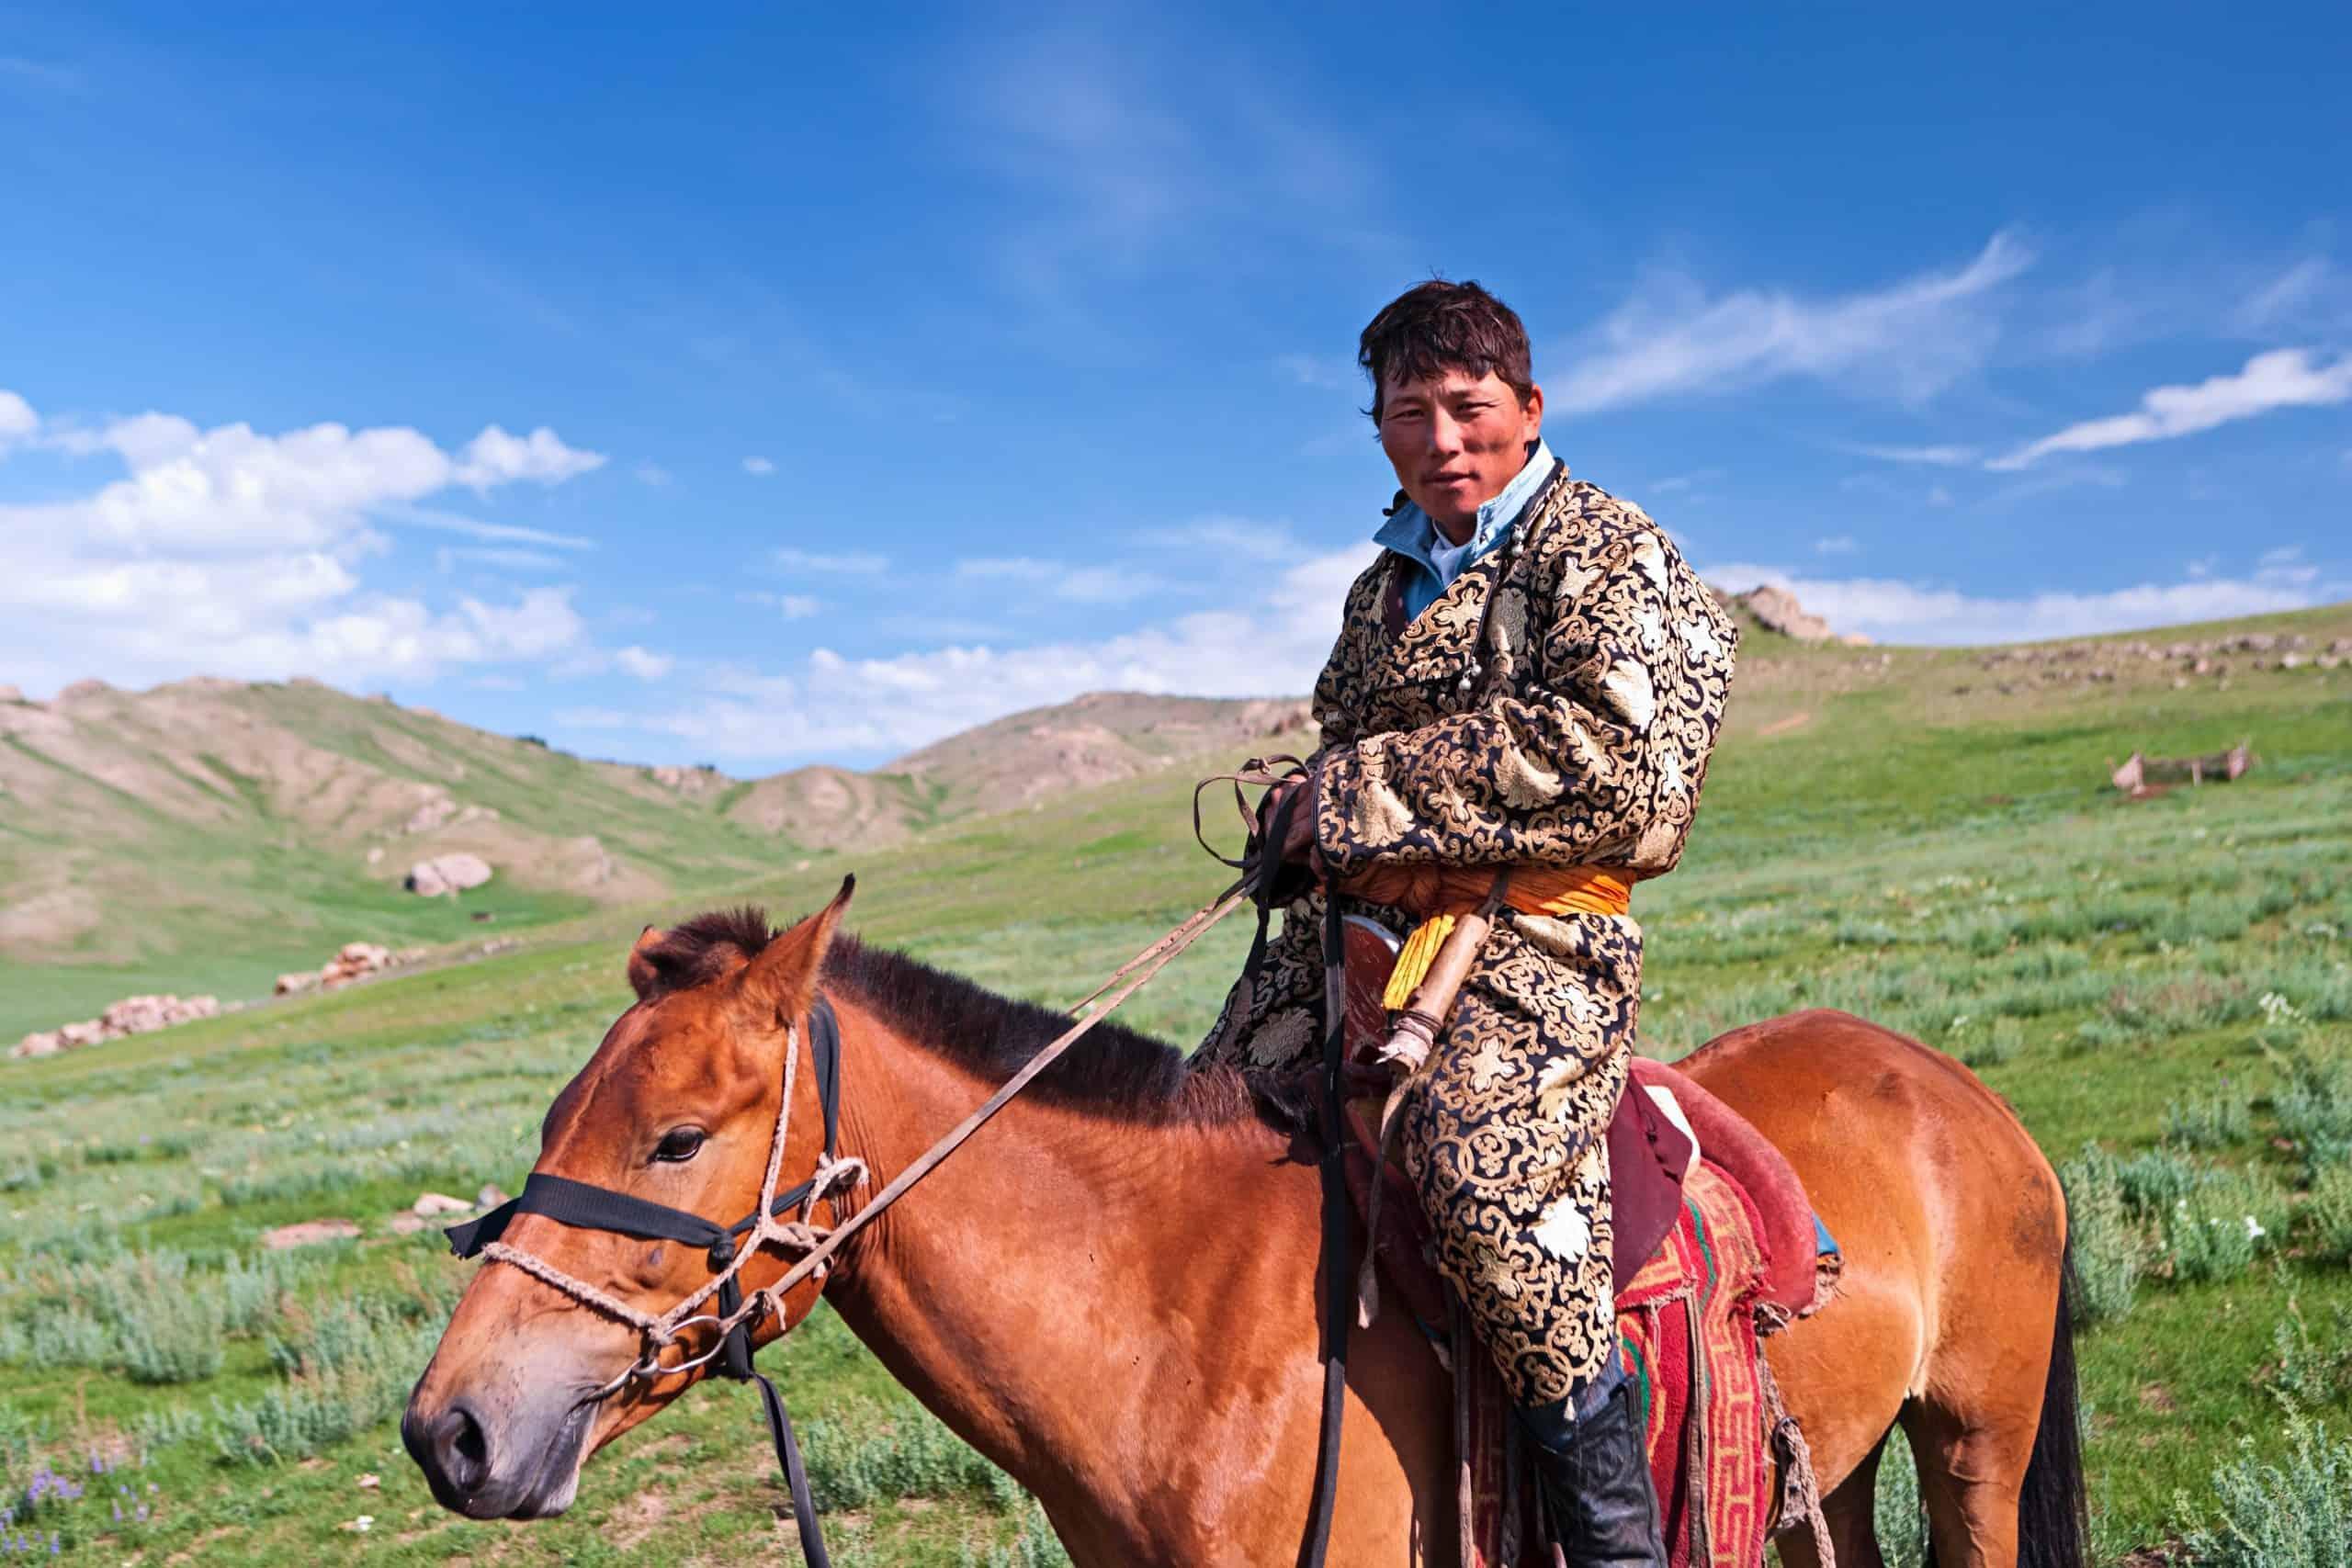 Mongolian horseback rider, meadow in background